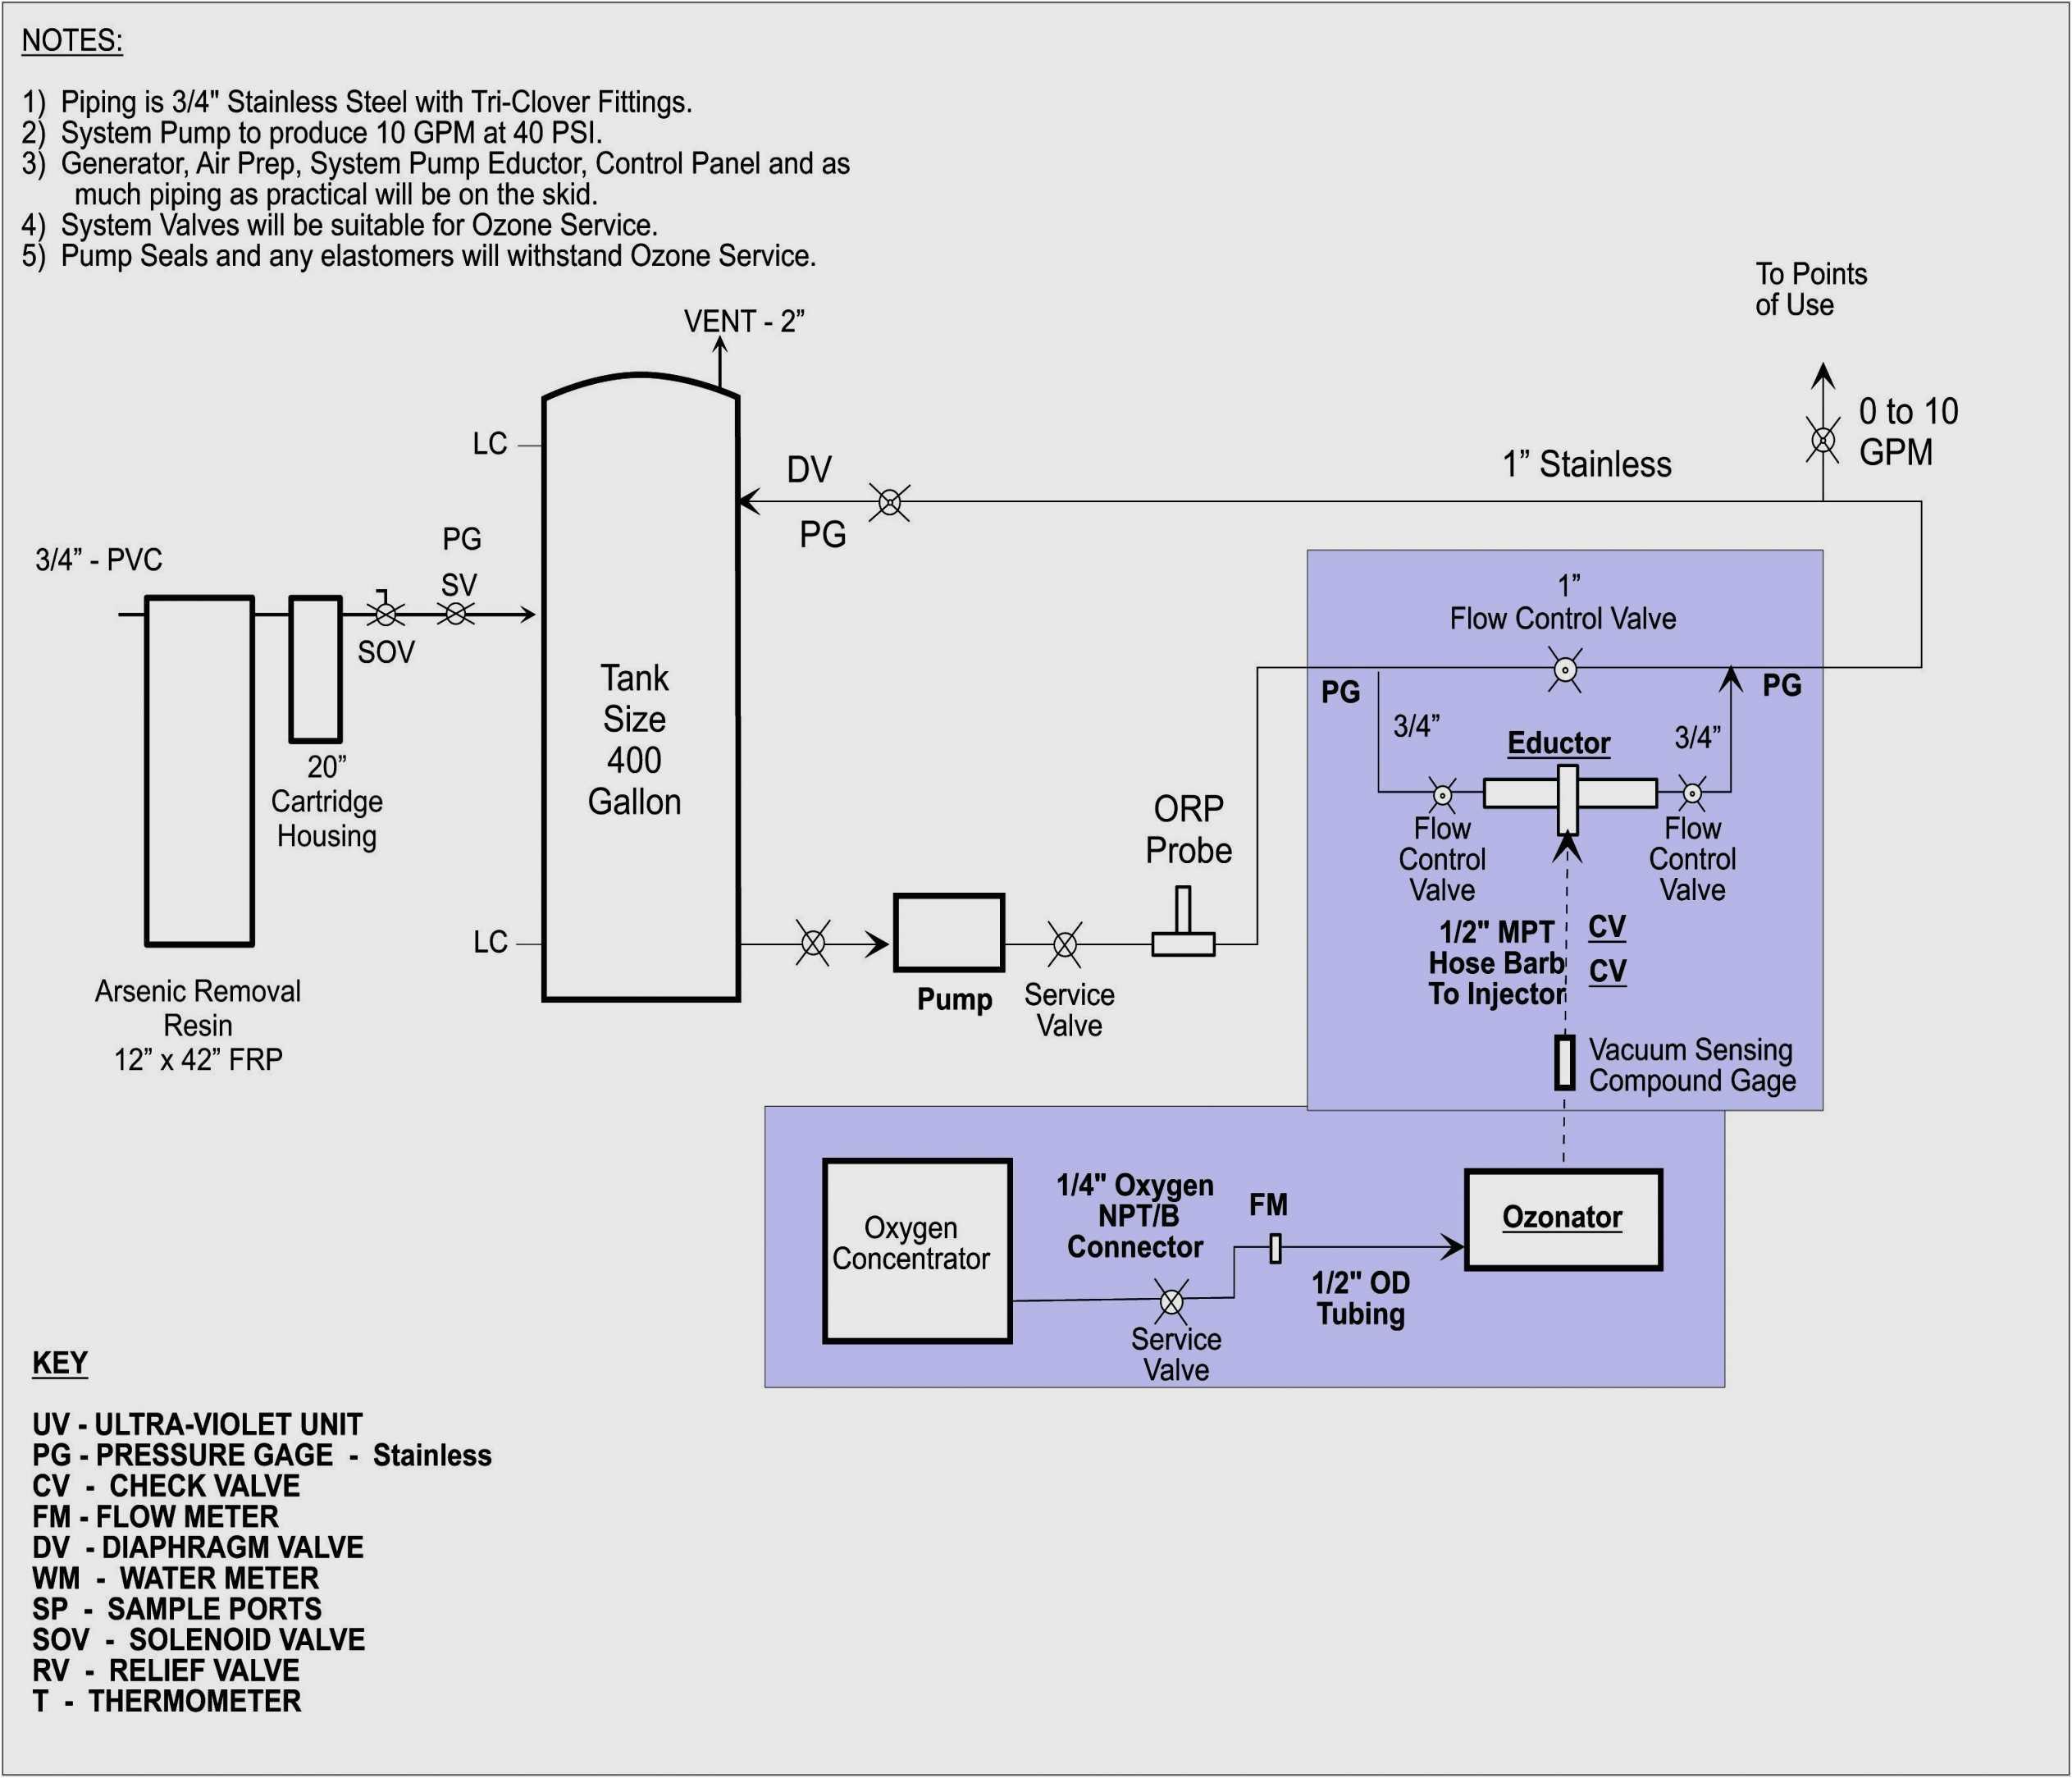 generac transfer switch wiring diagram view diagram wiring diagram manual transfer switch wiring diagram